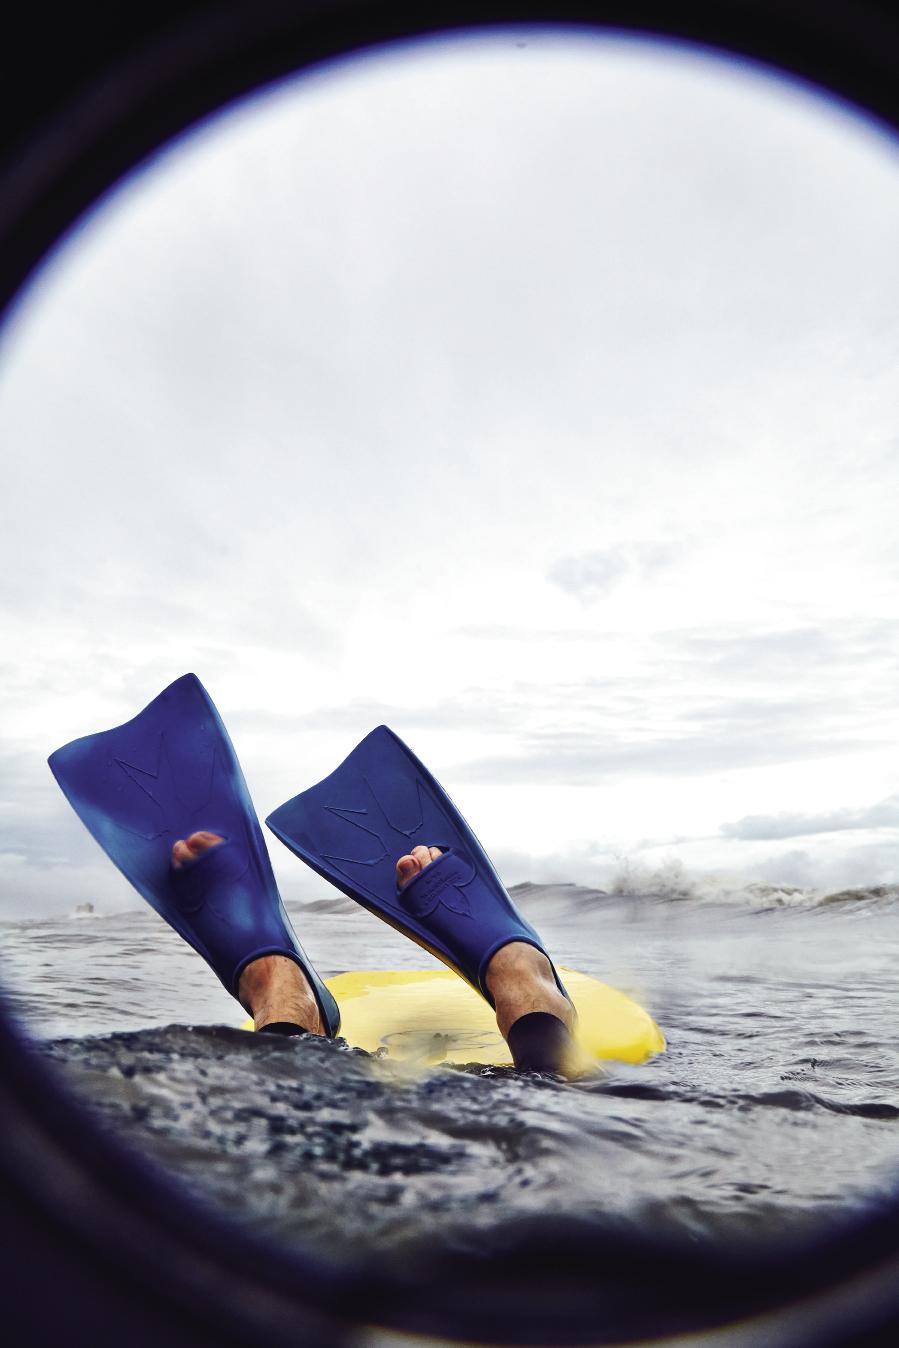 Photographer Peter Frank Edwards dives under a wave.